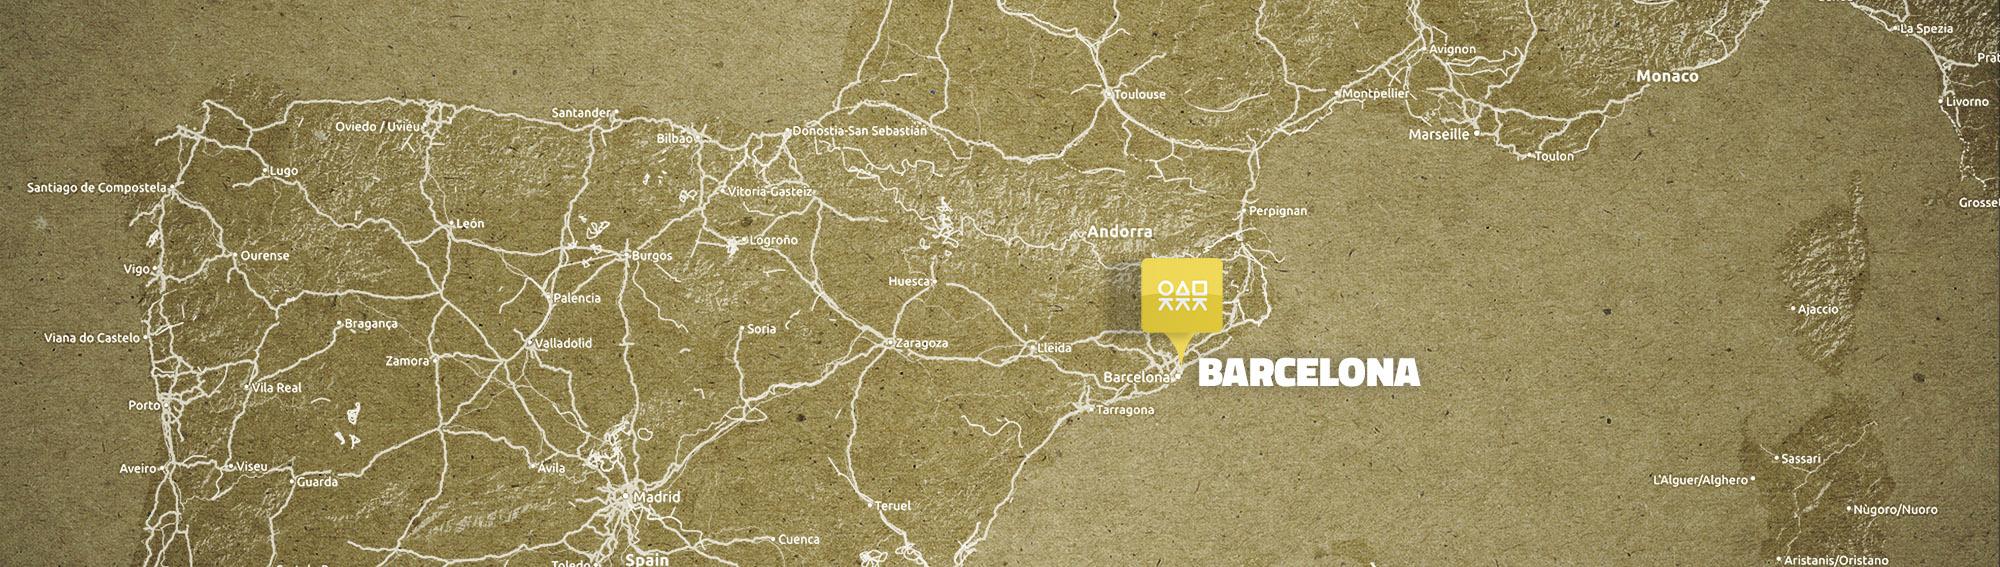 carte_barcelona